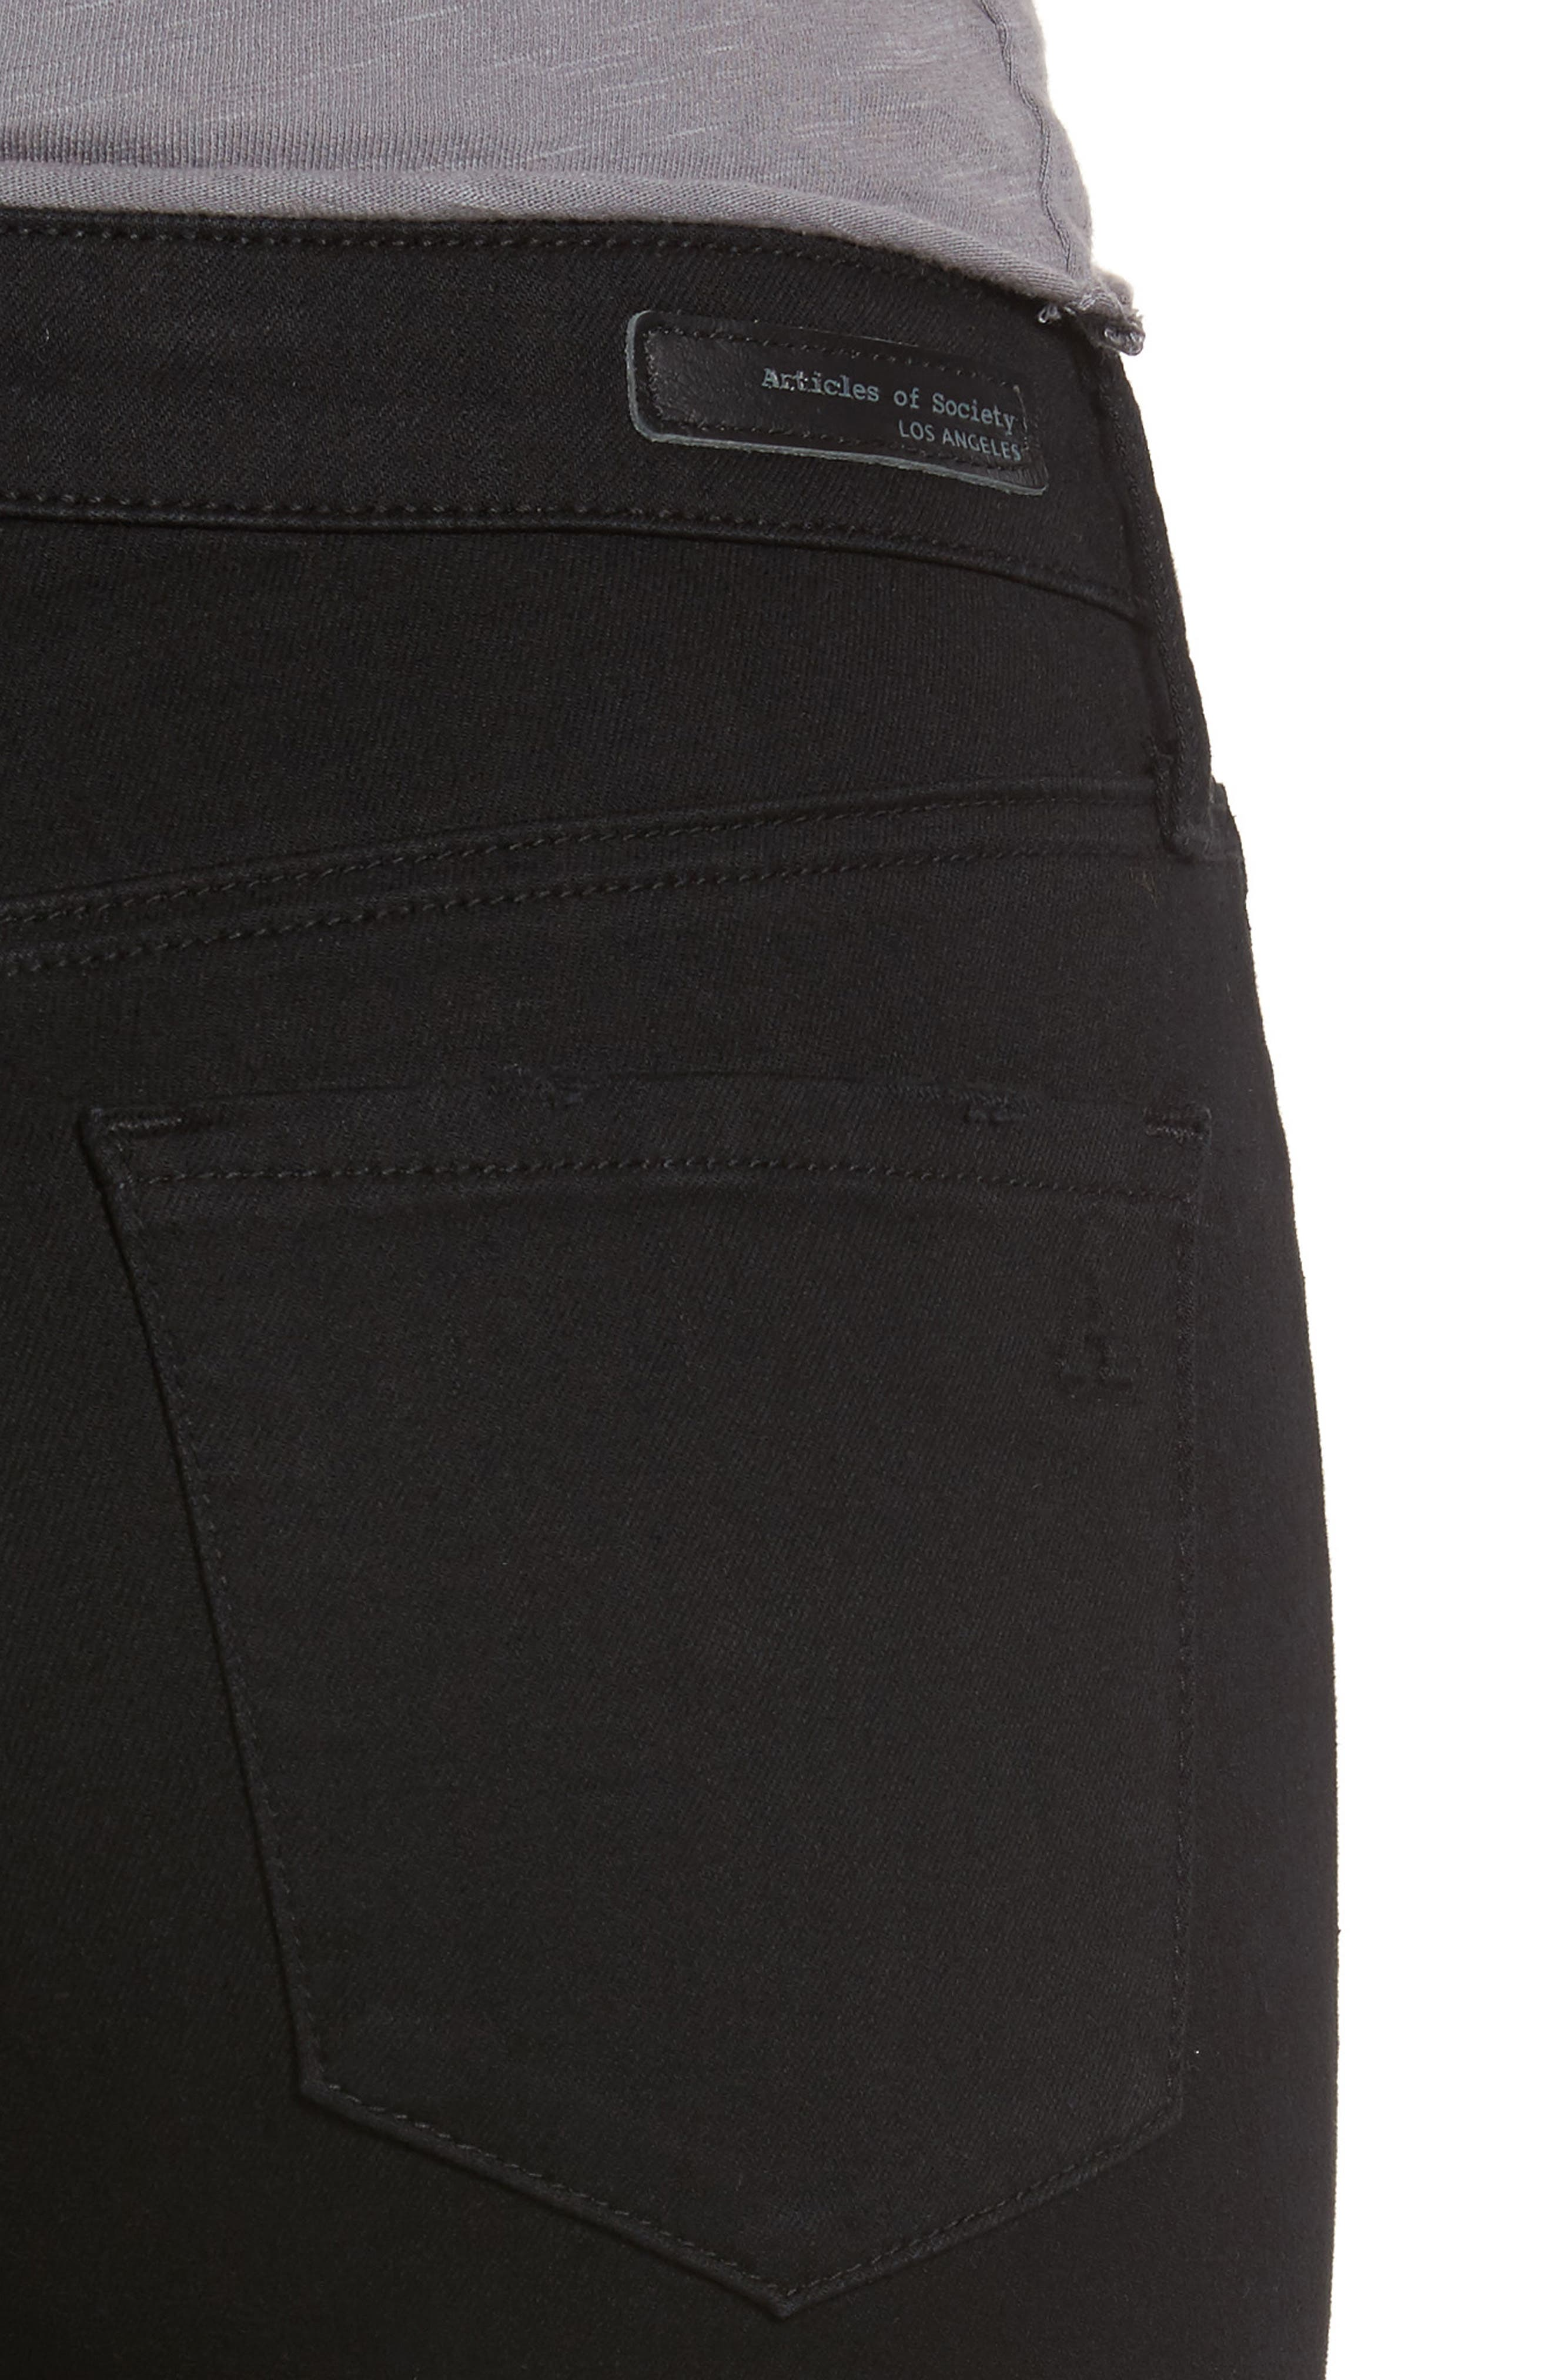 Sarah Skinny Jeans,                             Alternate thumbnail 4, color,